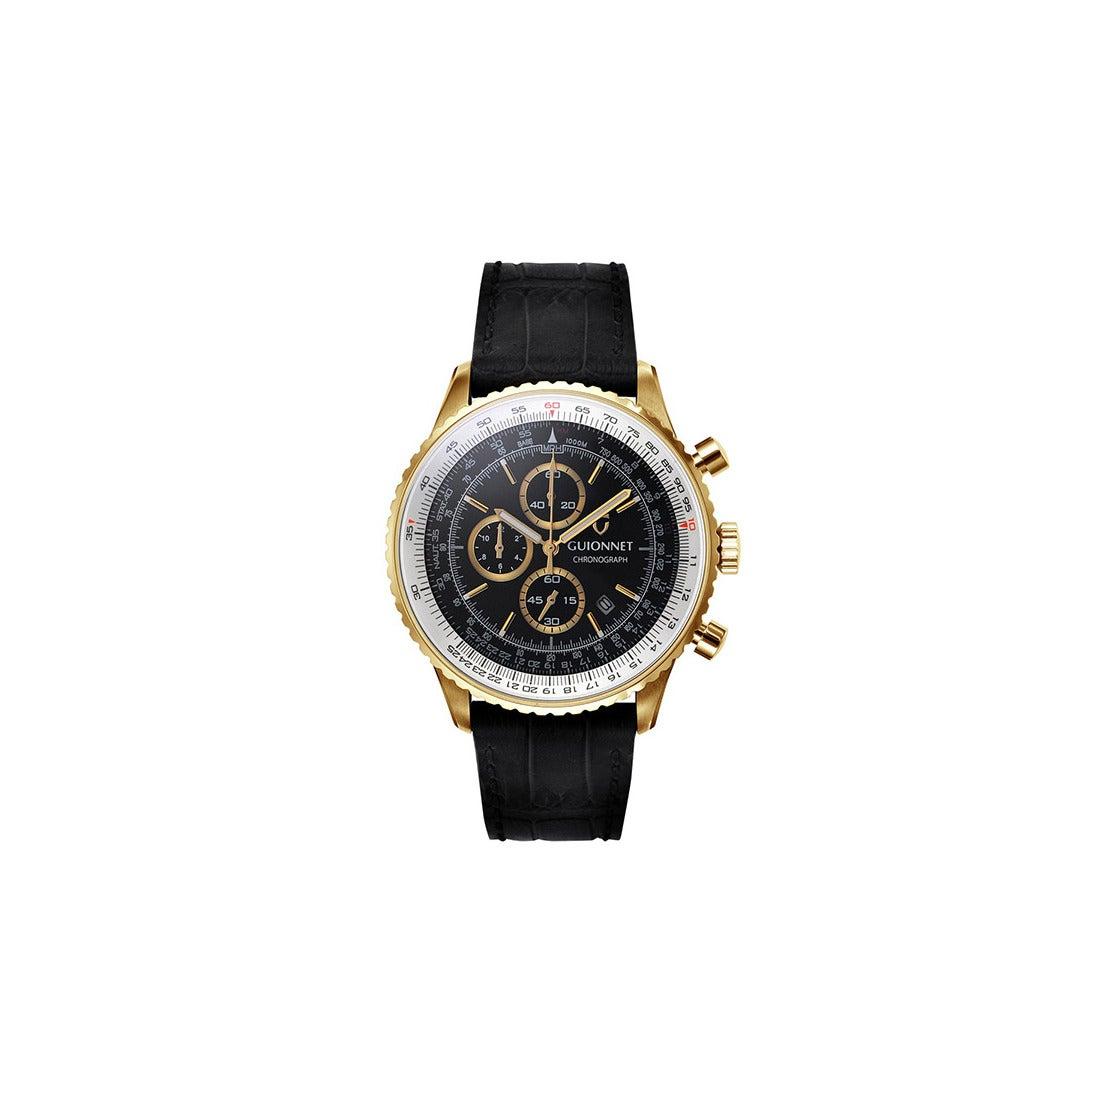 51a5c1f190 GUIONNET GUIONNET Flight Timer Professional 腕時計 FT44SSV メンズ(ブラック/ゴールド)  -靴&ファッション通販 ロコンド〜自宅で試着、気軽に返品